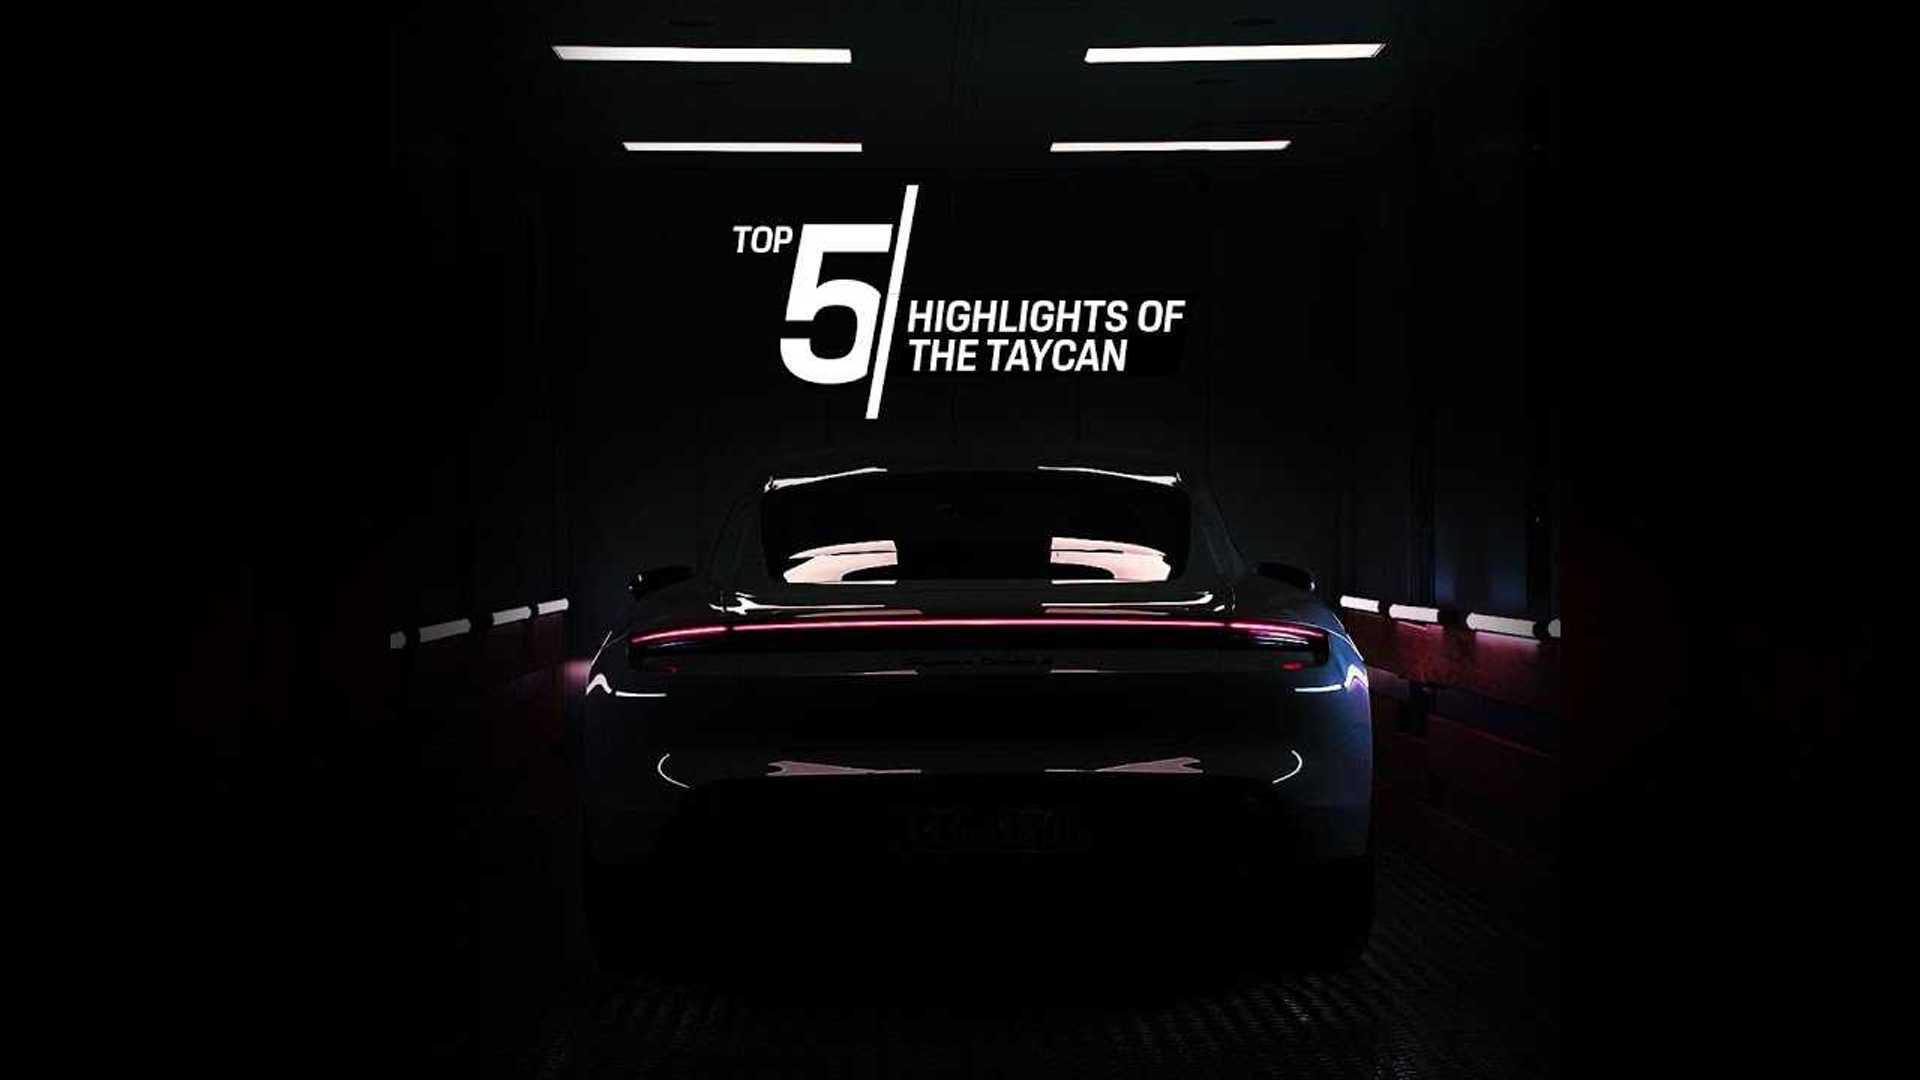 Porsche Top 5 series focuses on Taycan